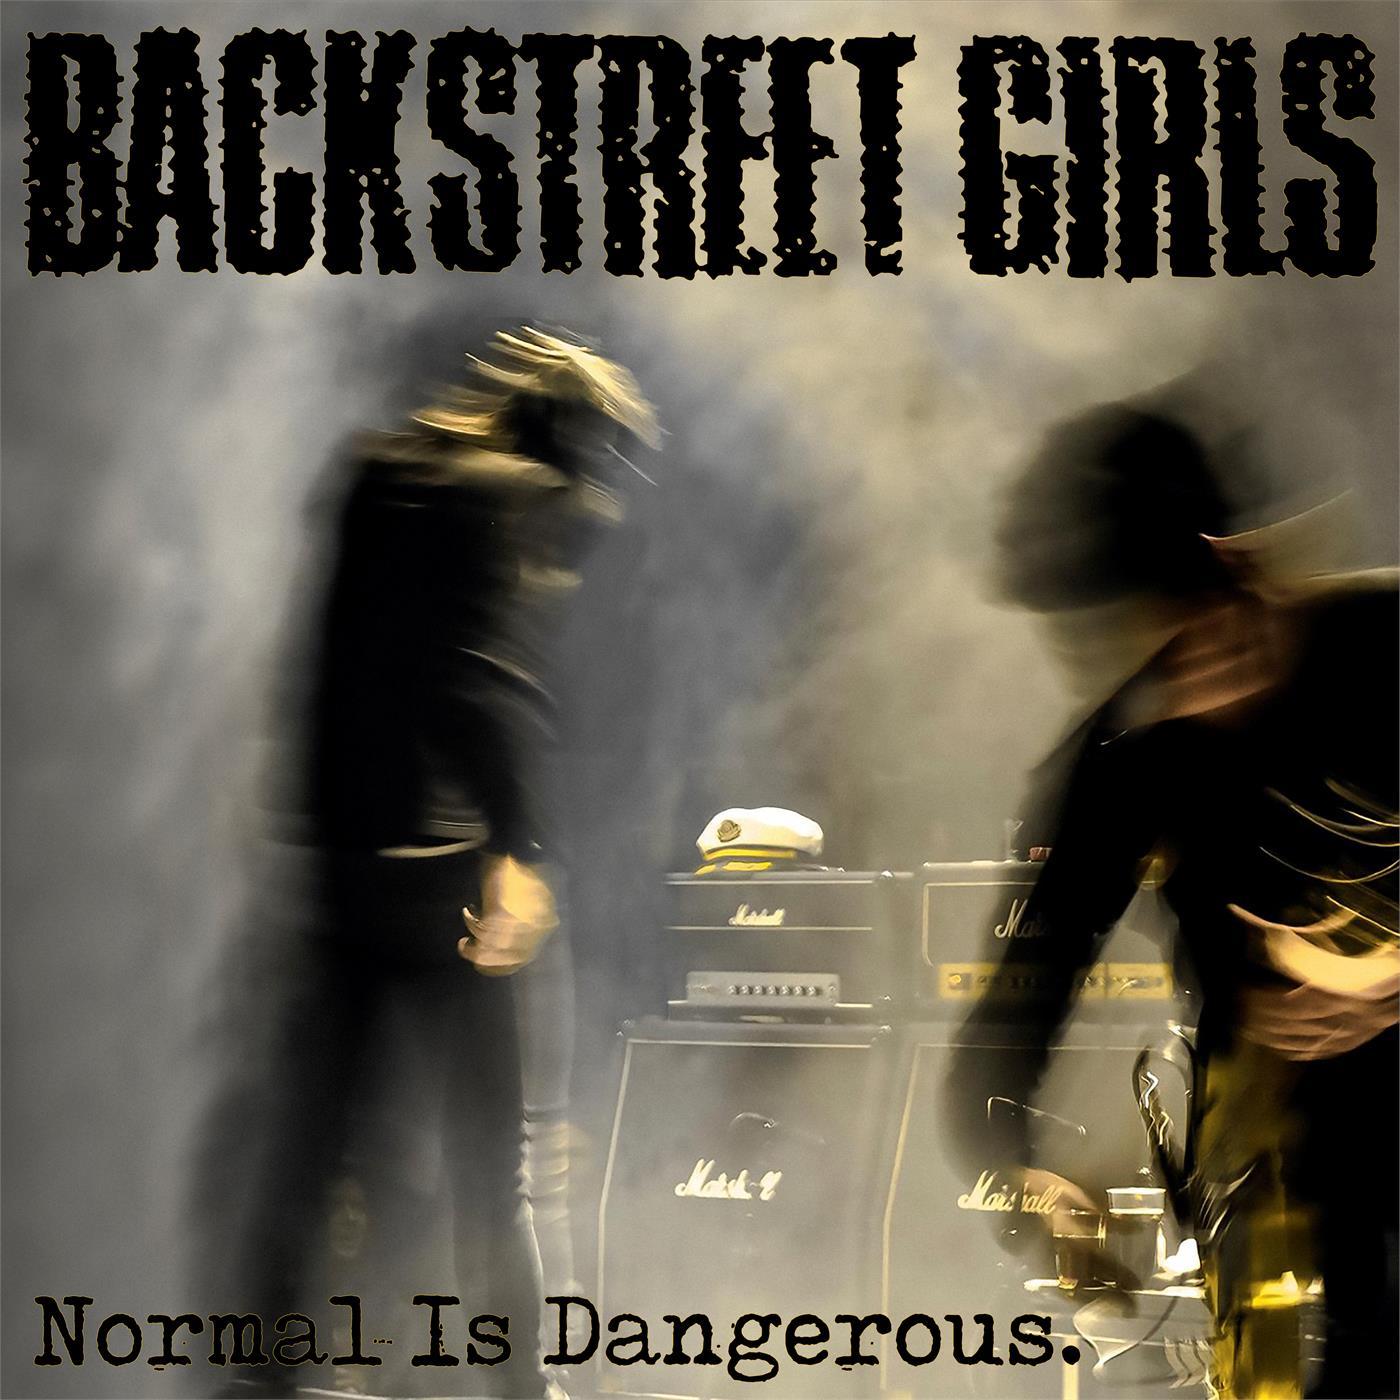 Backstreet Girls - Normal is Dangerous [LP]